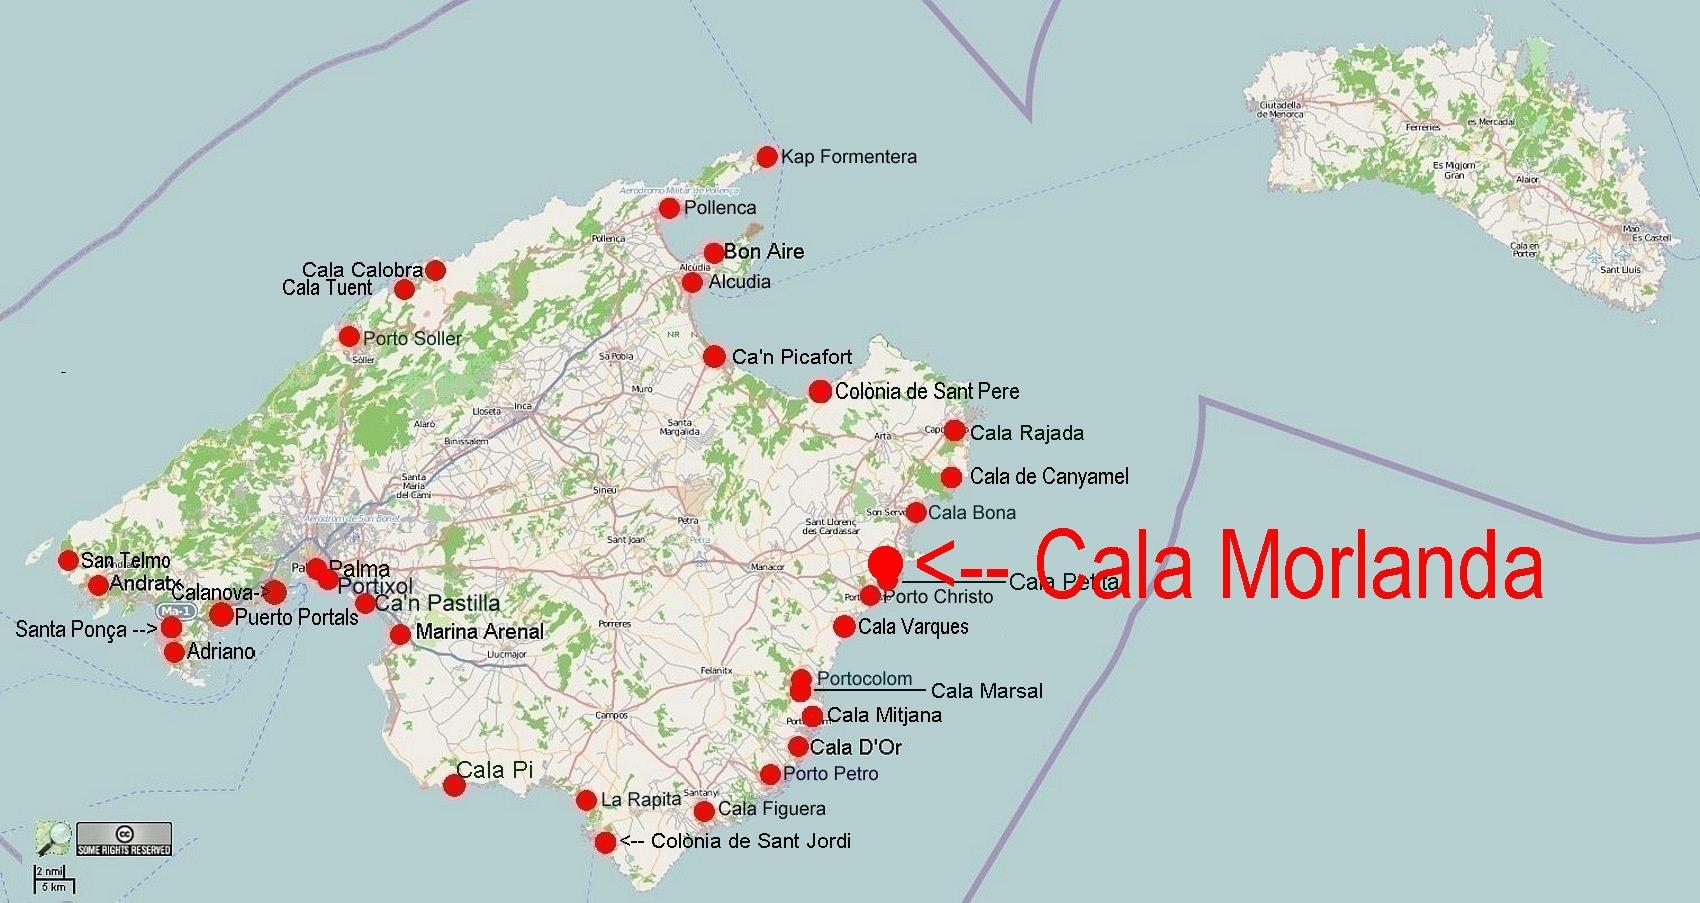 Unwetter Mallorca Karte.Online Hafenhandbuch Spanien Ankerbucht Cala Morlanda